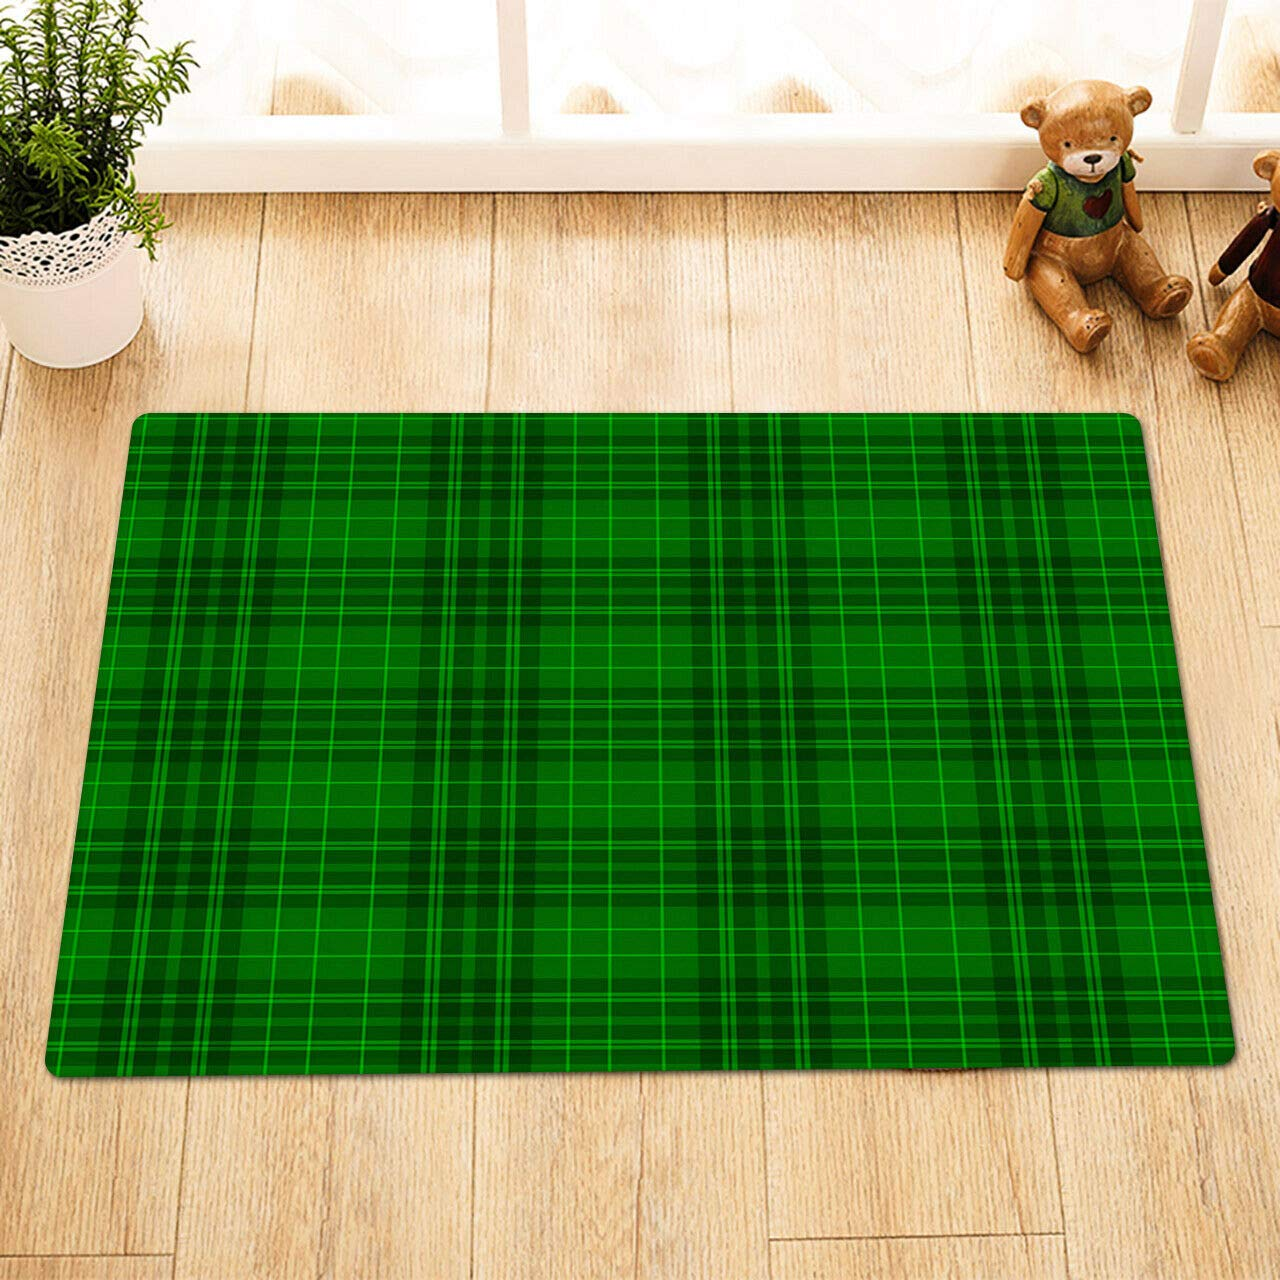 60 x 40 cm hdrjdrt Color Verde Felpudo de Ducha dise/ño de Cuadros